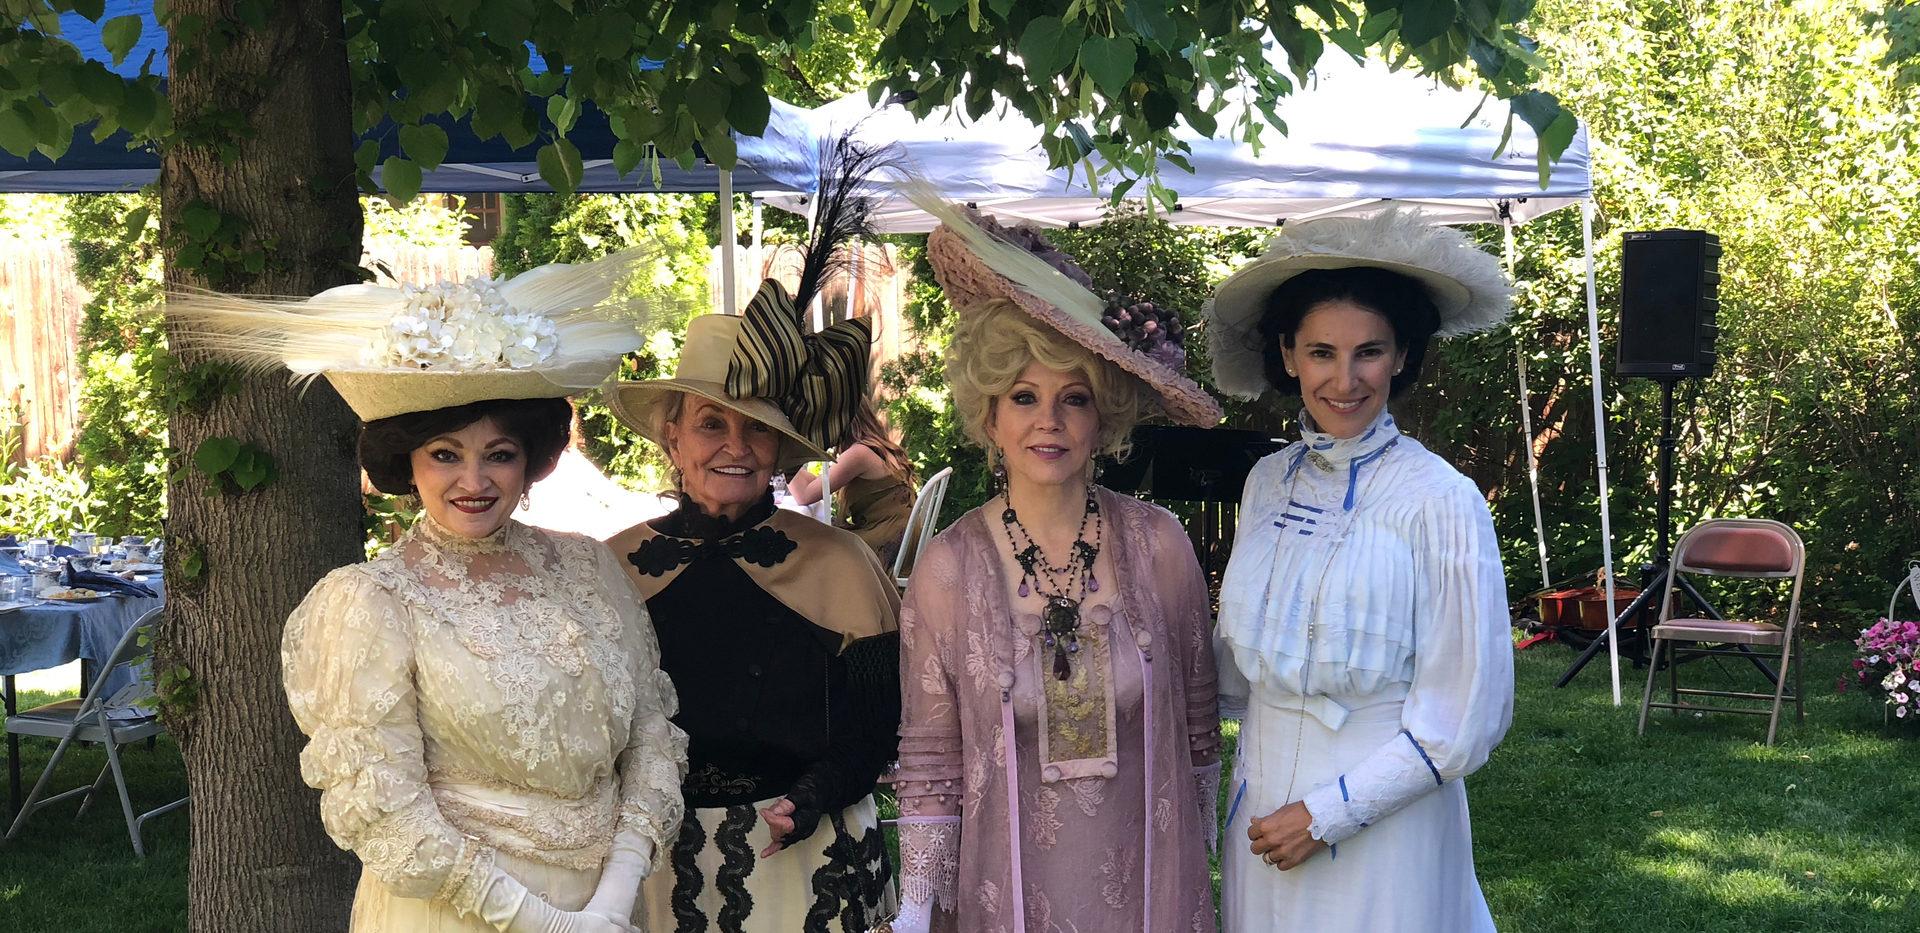 Tea in Fort Collins, CO - Rita Smith, Dottie Bakke, Lonna Miller & Nico Nagel